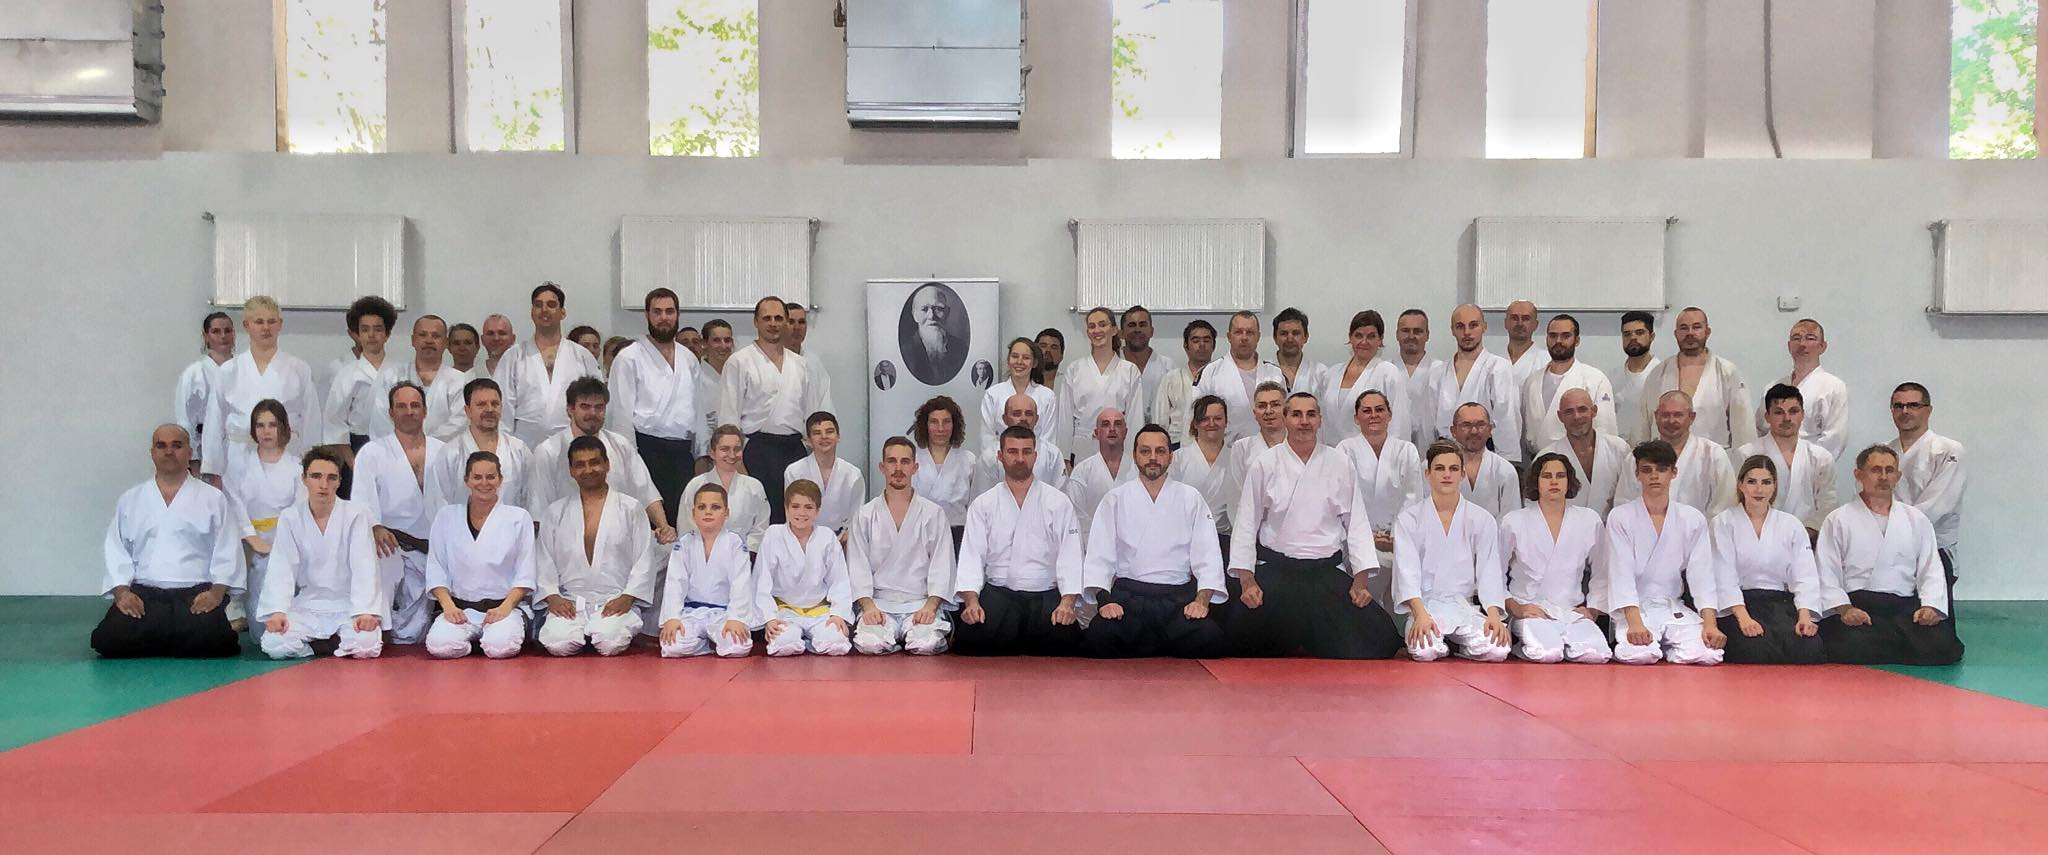 #BeActive - Baráti aikido edzőtábor